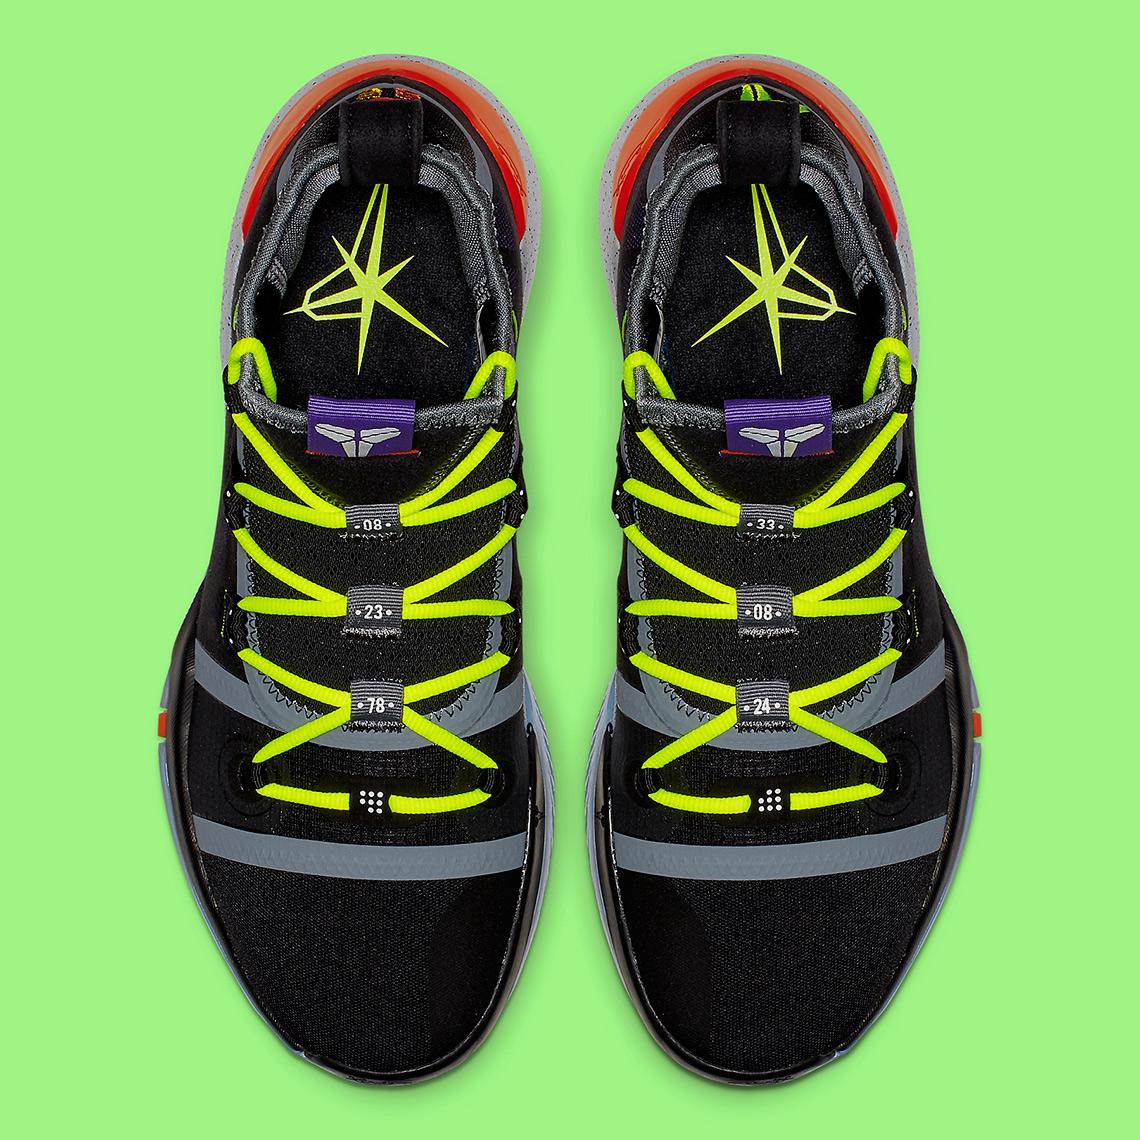 7af91dad6 Nike Kobe AD Chaos AV3555-003 Release Date | SneakerNews.com